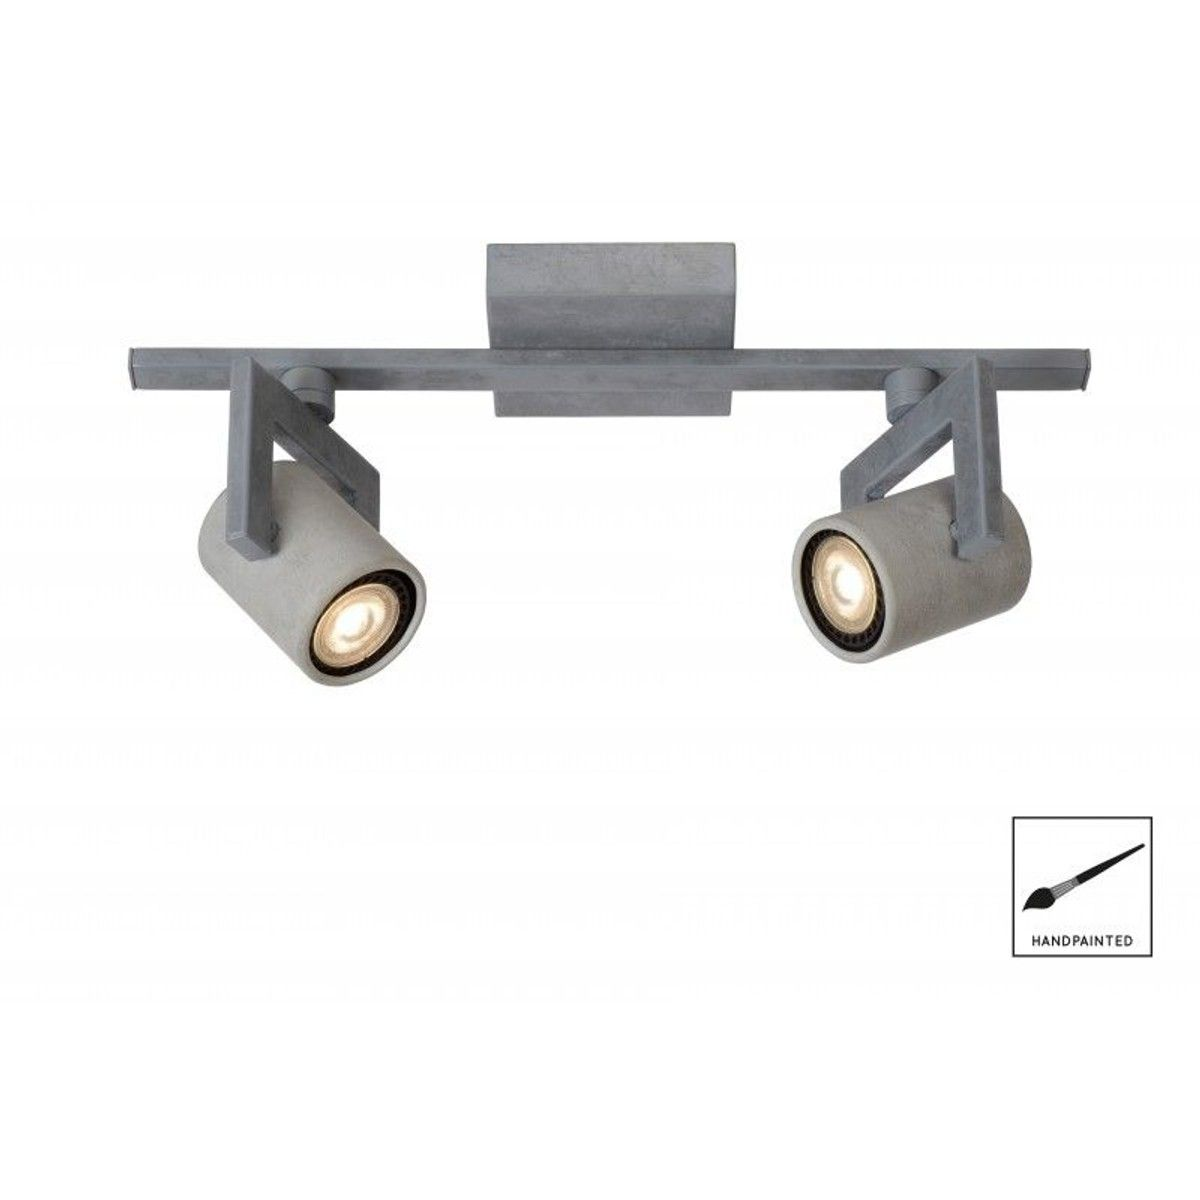 Spot Plafond Conni Led D6 Cm Led Dim Gu10 2x5w 3000k Taille Tu Spot Plafond Led Industriel